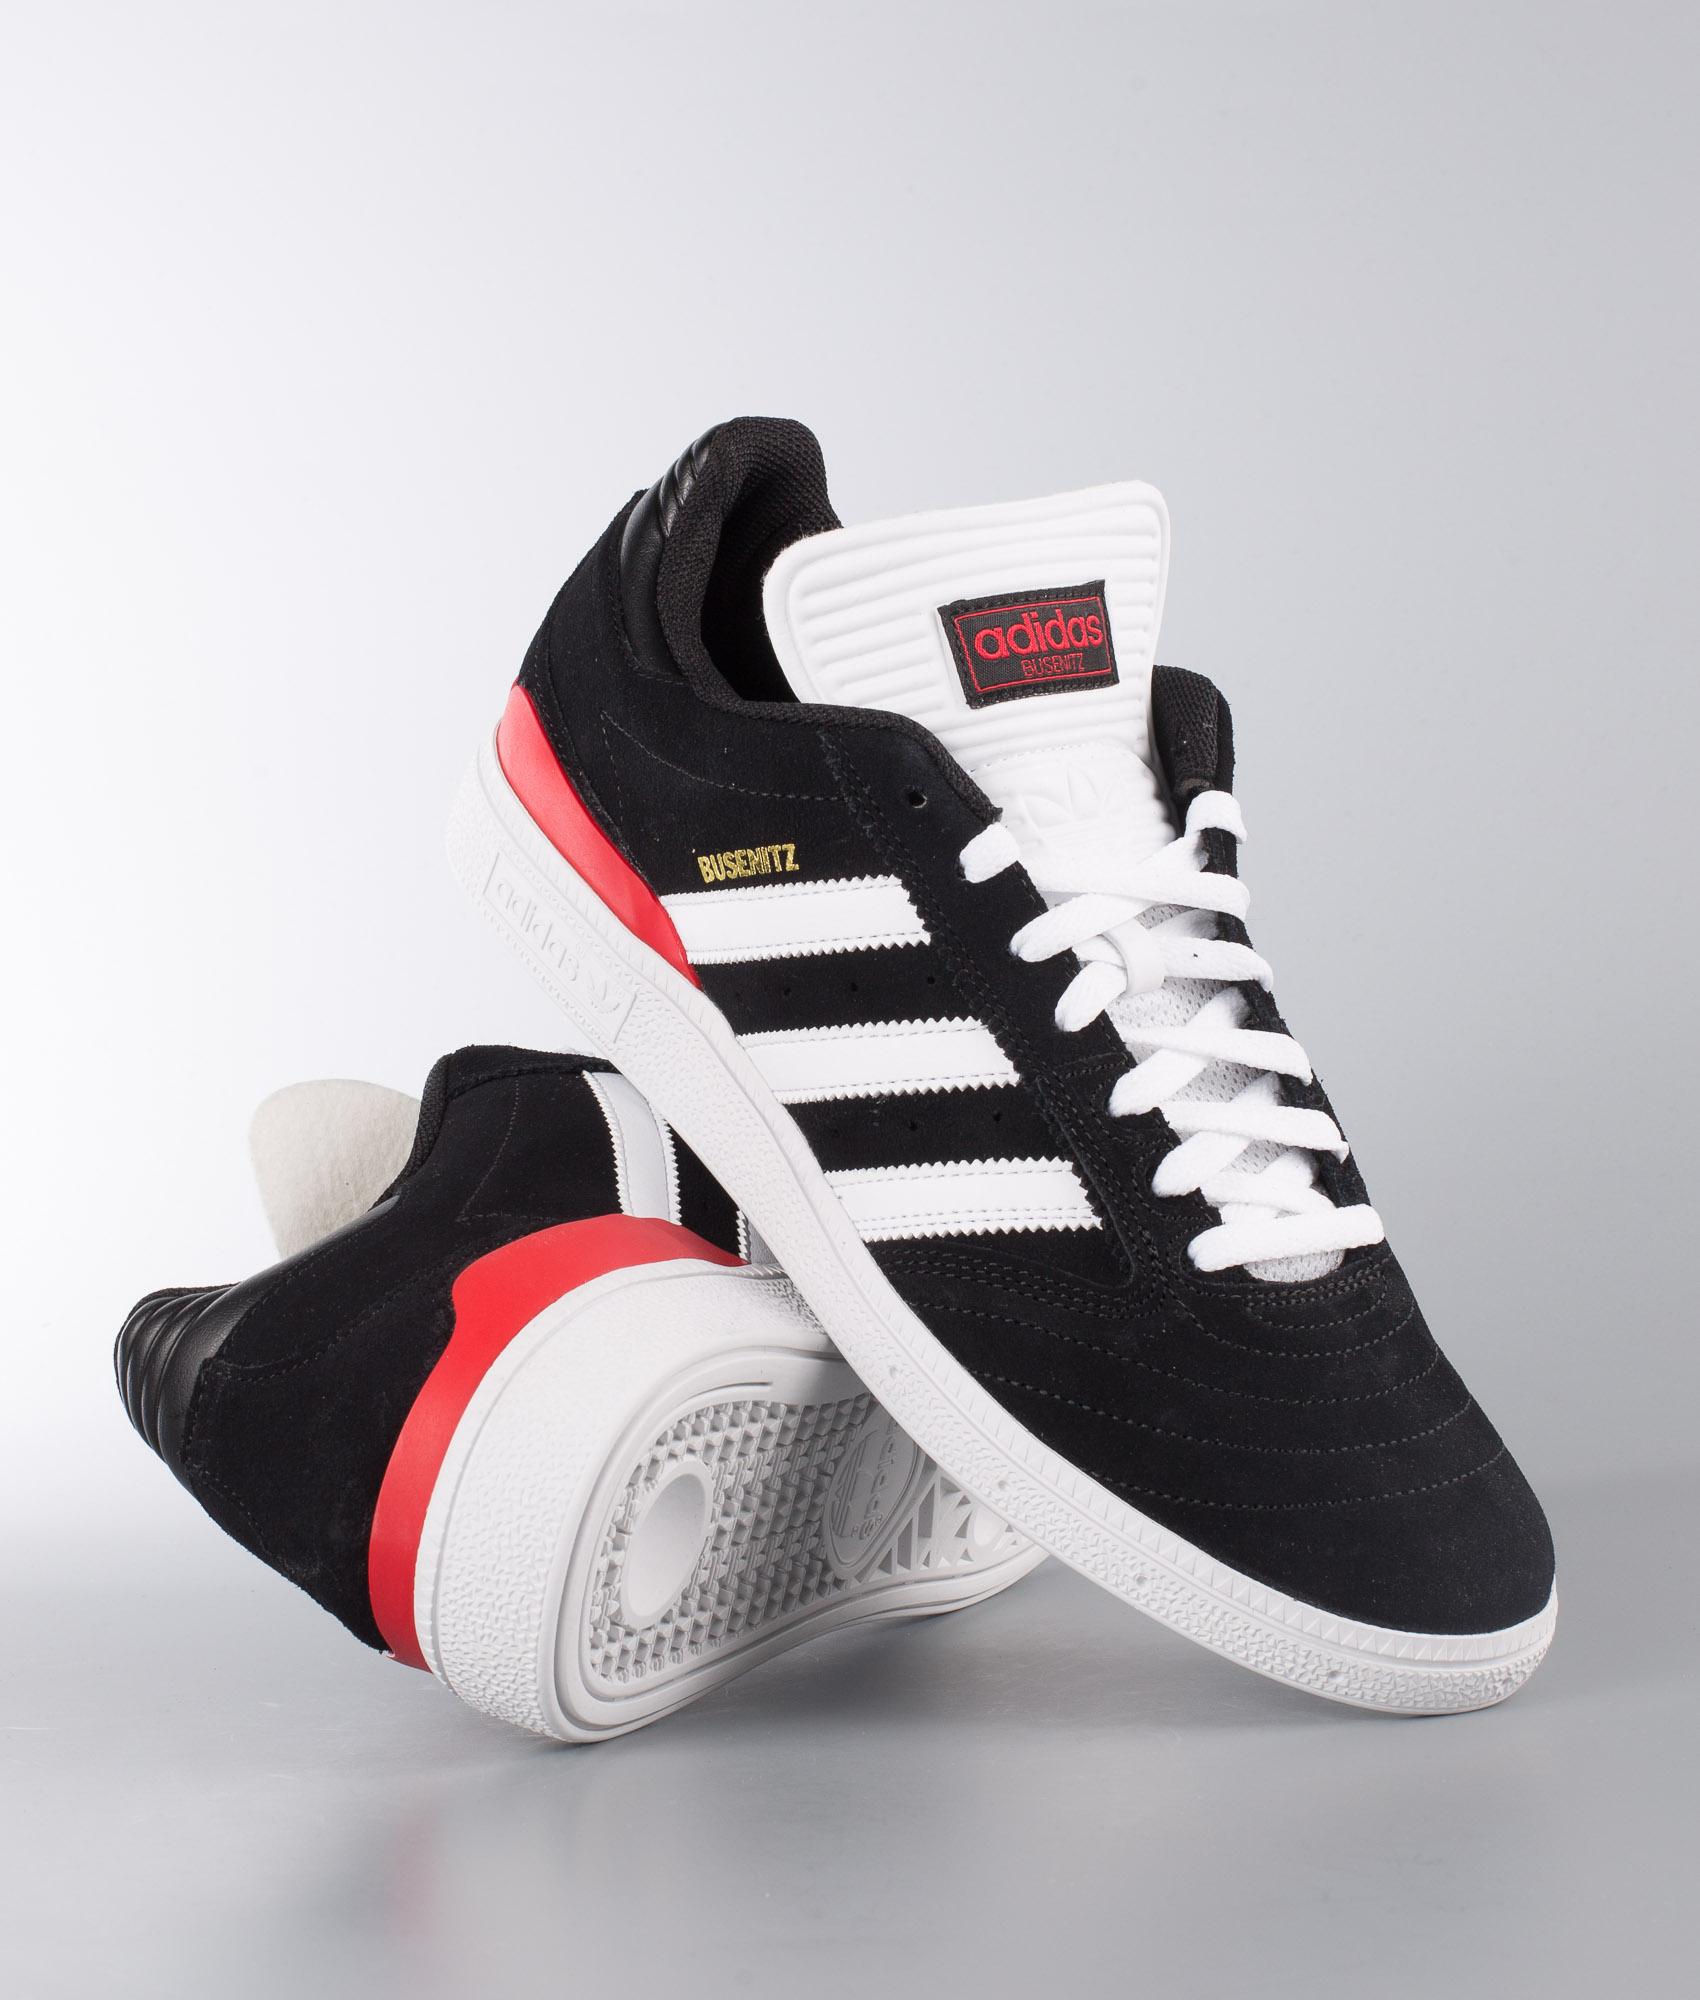 Chez Blackftwr Adidas Core SkateboardingBusenitz De Chaussures 4q5ARLSc3j